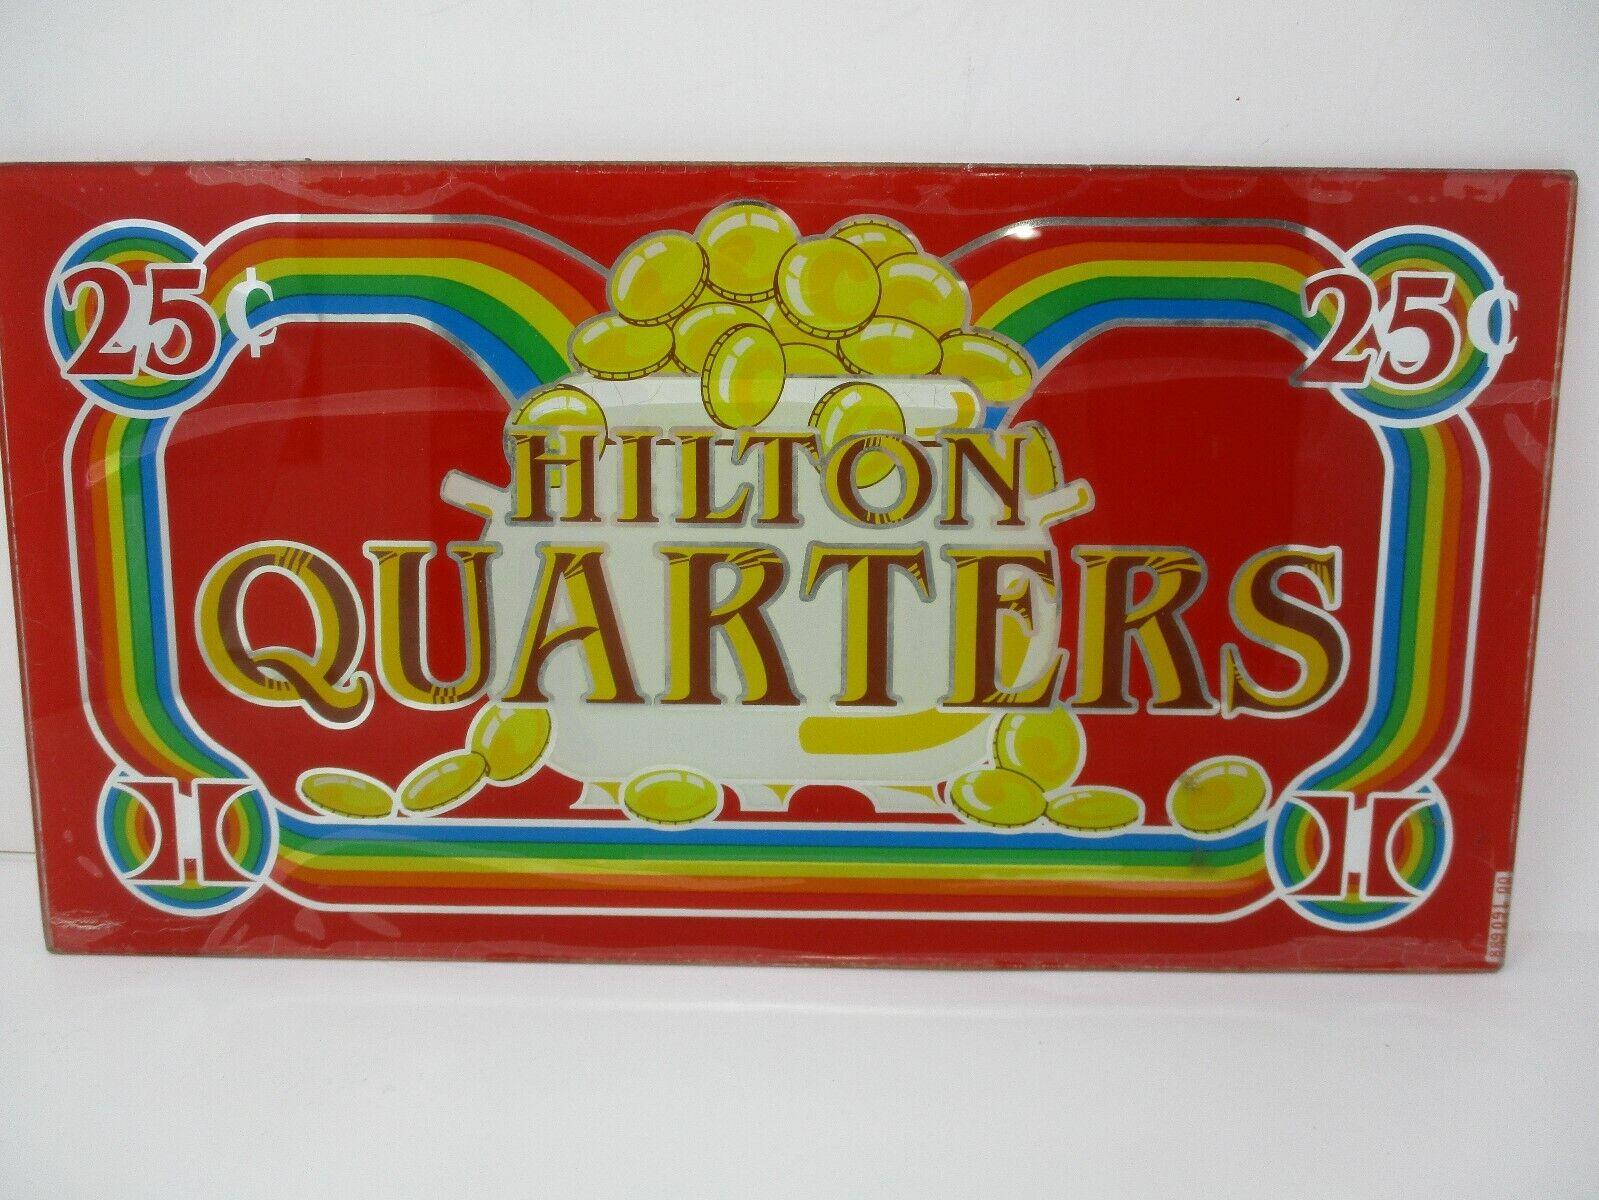 Hilton Casino Quarters Retired Atlantic City Glass Slot Machine Front Face Plate